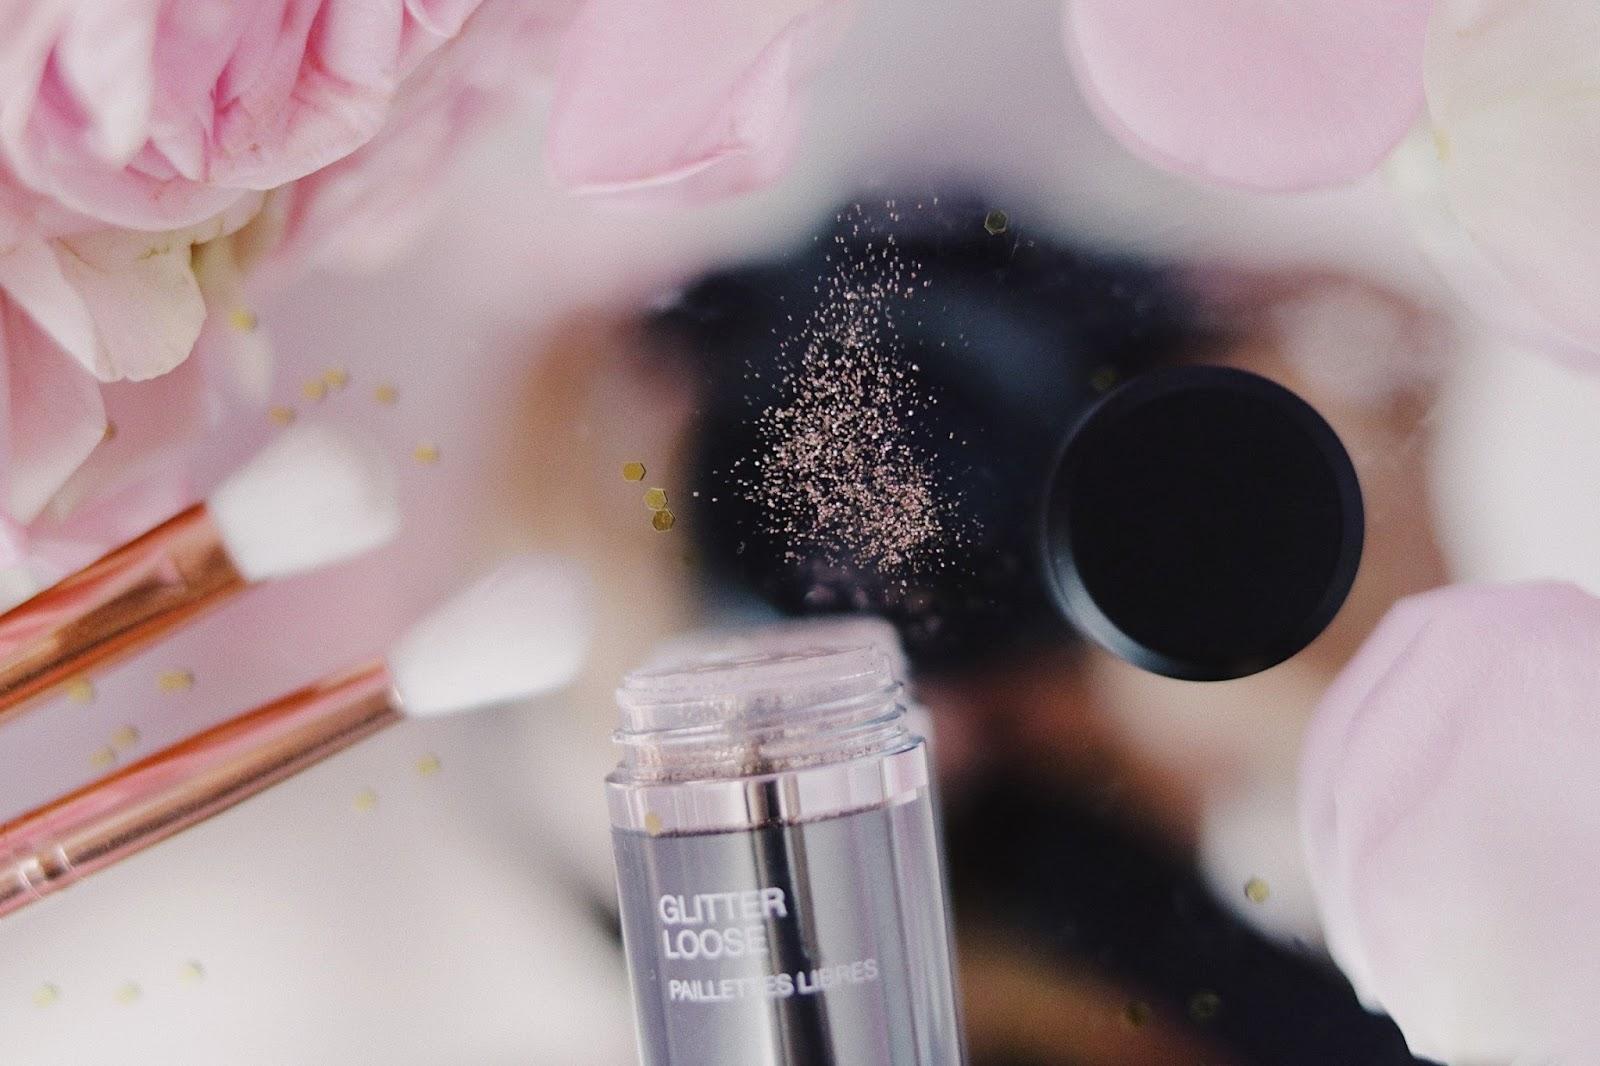 Kiko Milano , Cut Crease , Glitter Cut Crease , Summer 2.0 , Spring 2.0 , By Terry , Agence CRC , avis , revue , tutoriel maquillage , rose mademoiselle , rosemademoiselle , blog beauté , paris , france ,